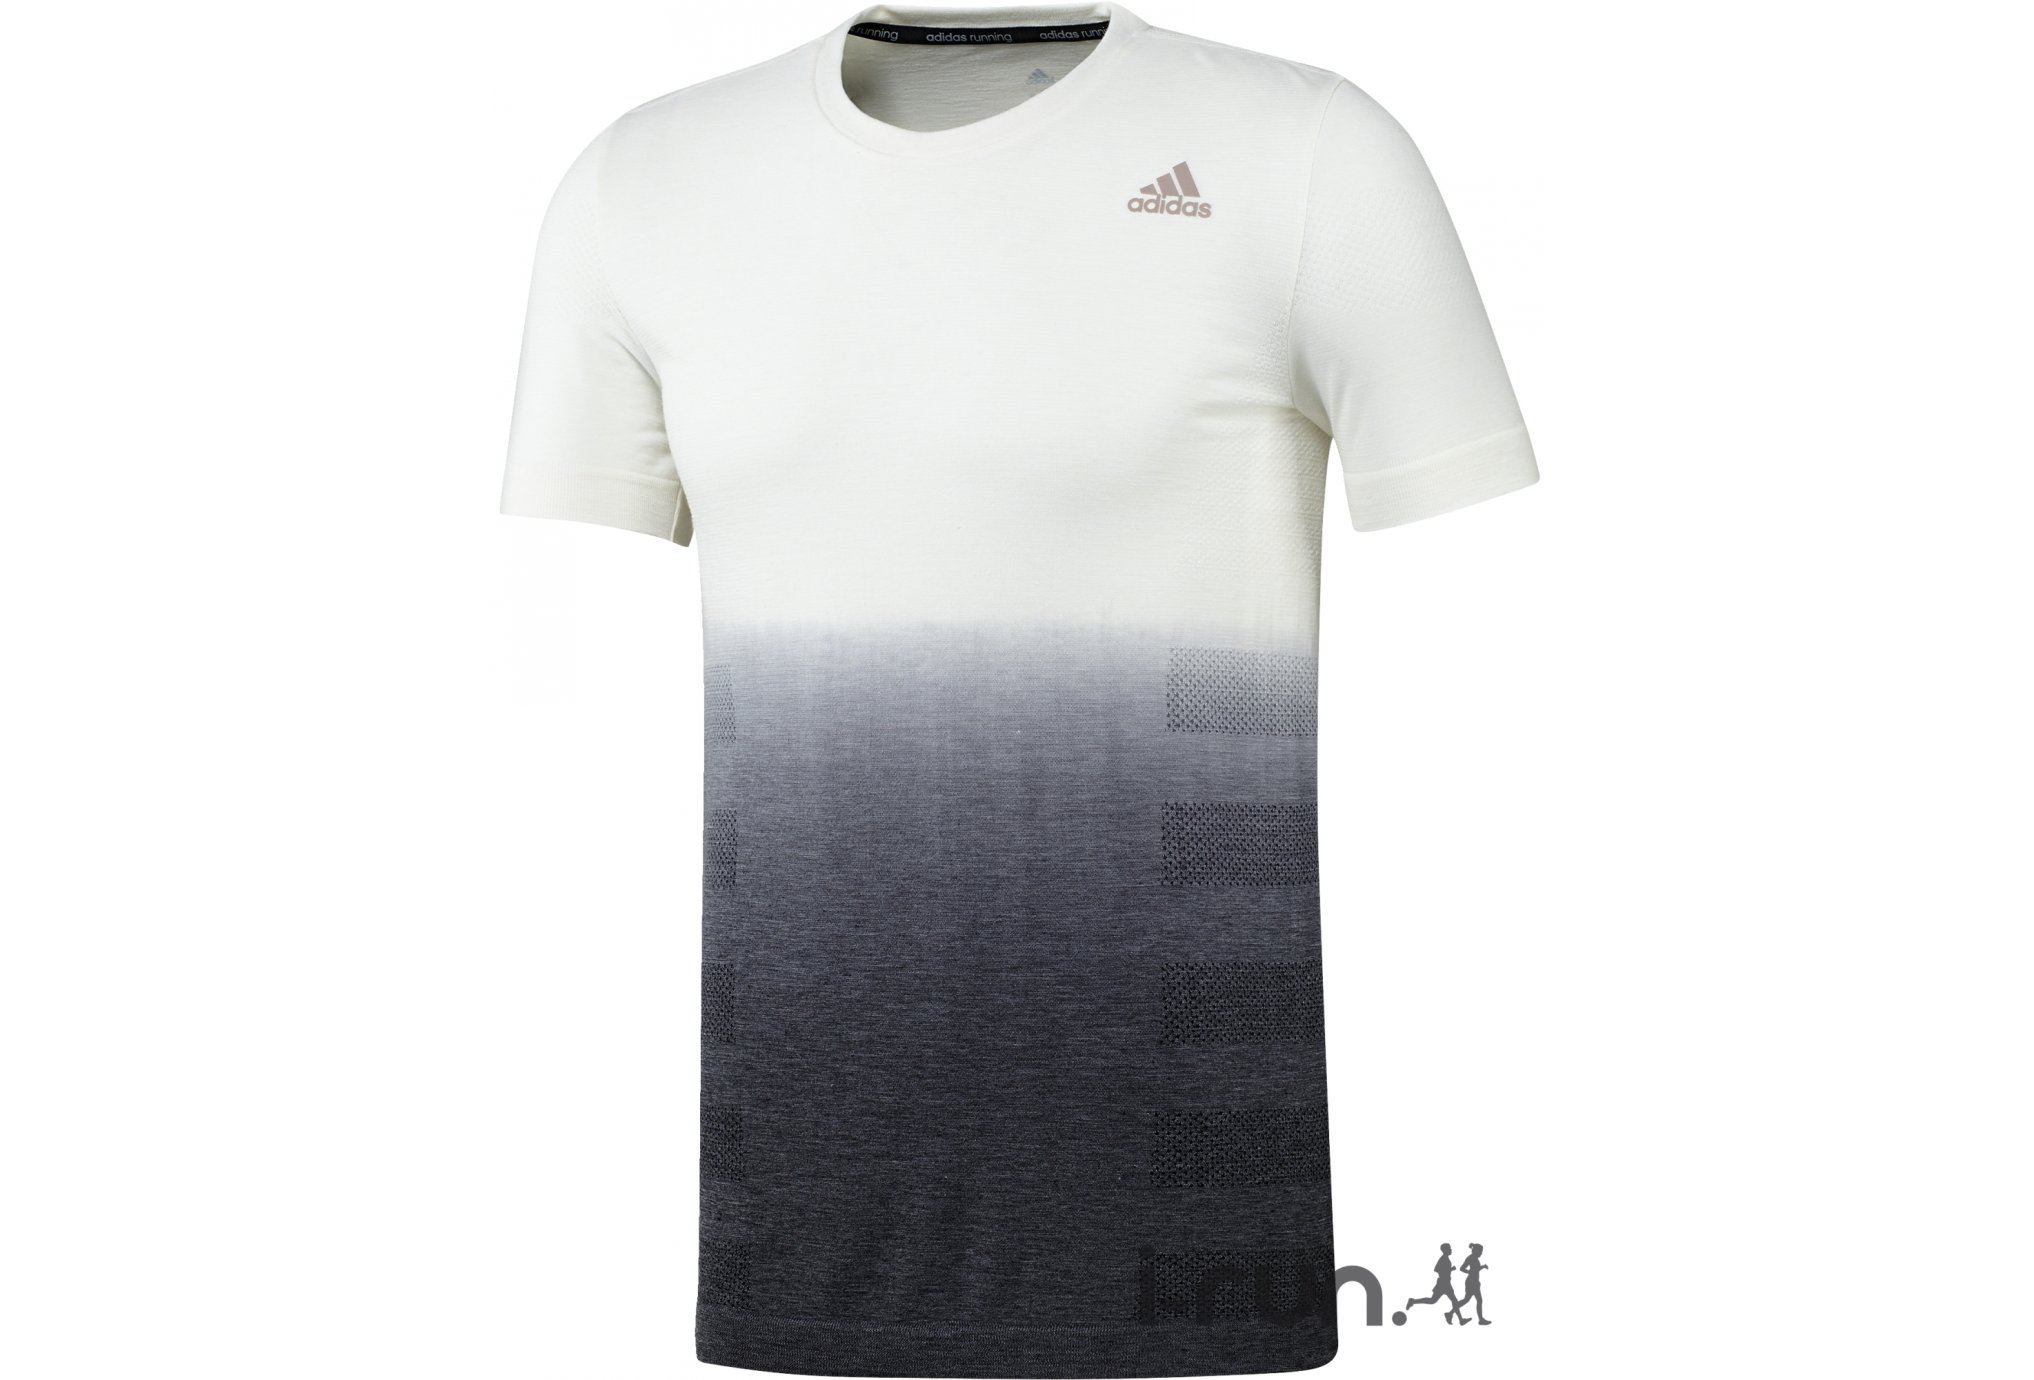 Adidas Adistar primeknit wool dip-Dyed m vêtement running homme